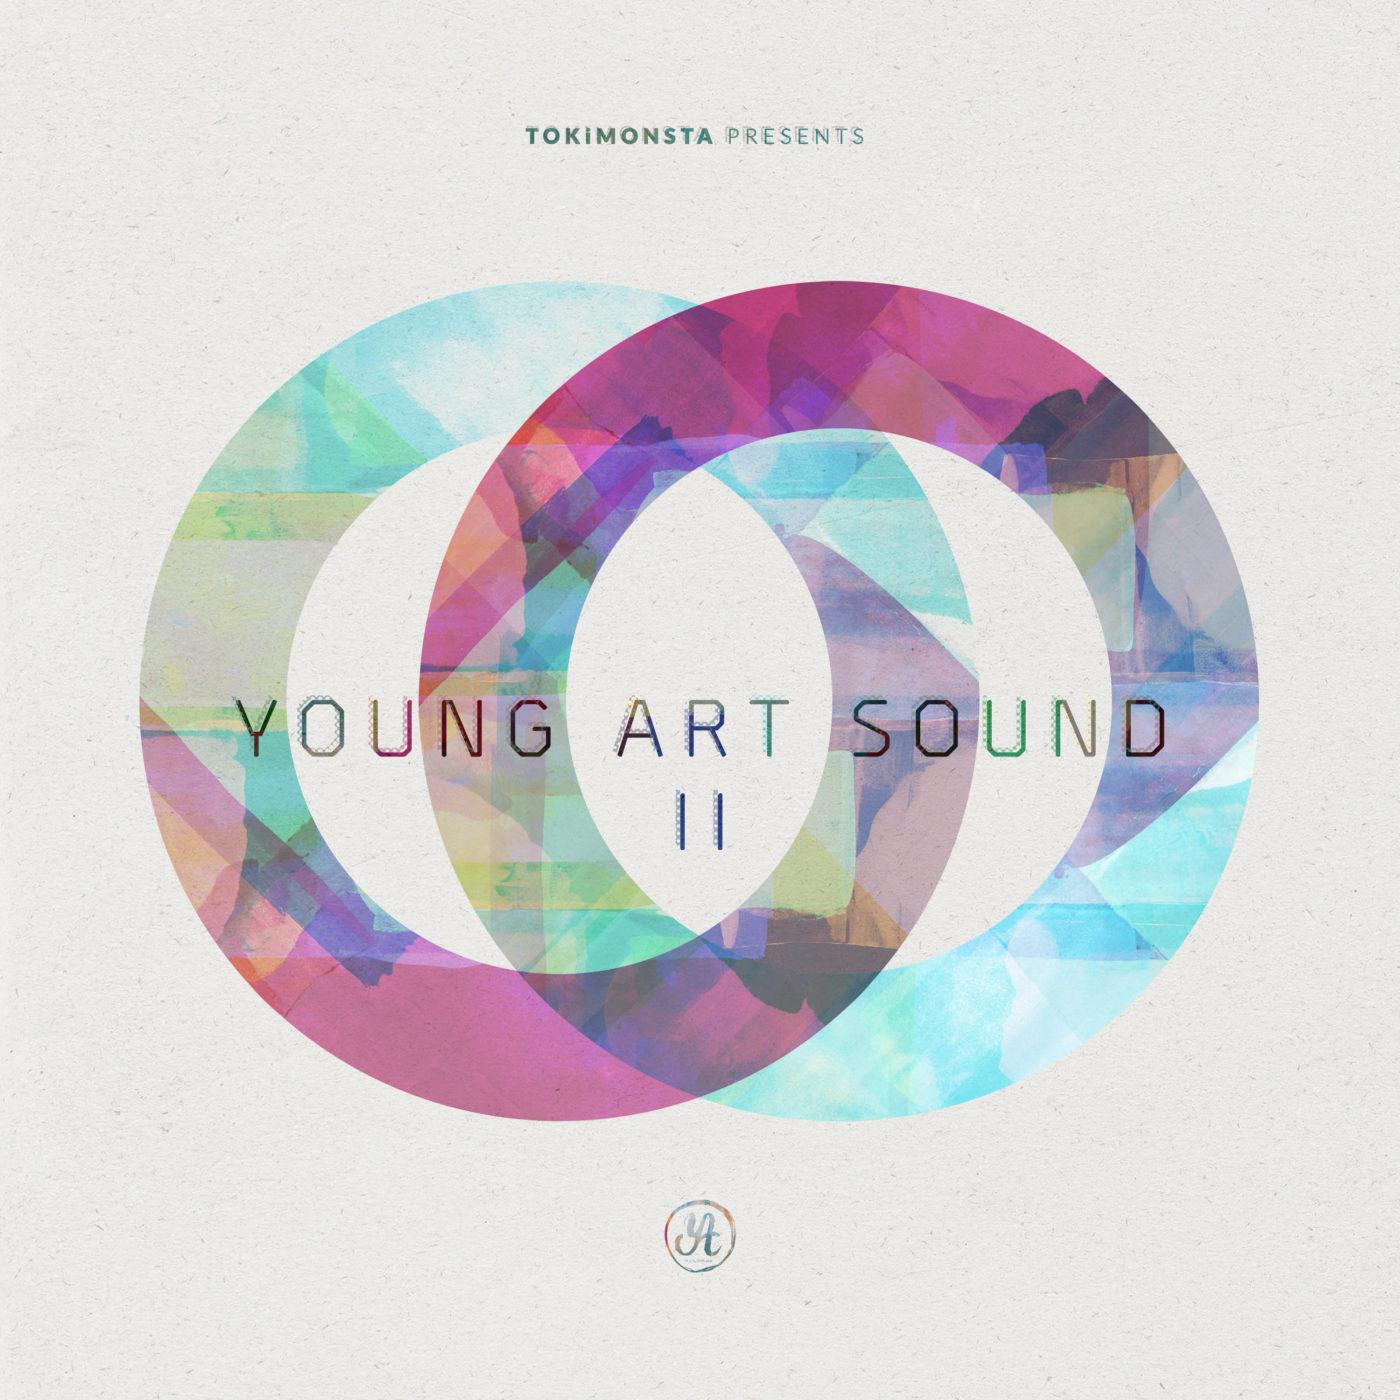 MNDR Mars Tokimonsta Presents Young Art Sound II Cover Art